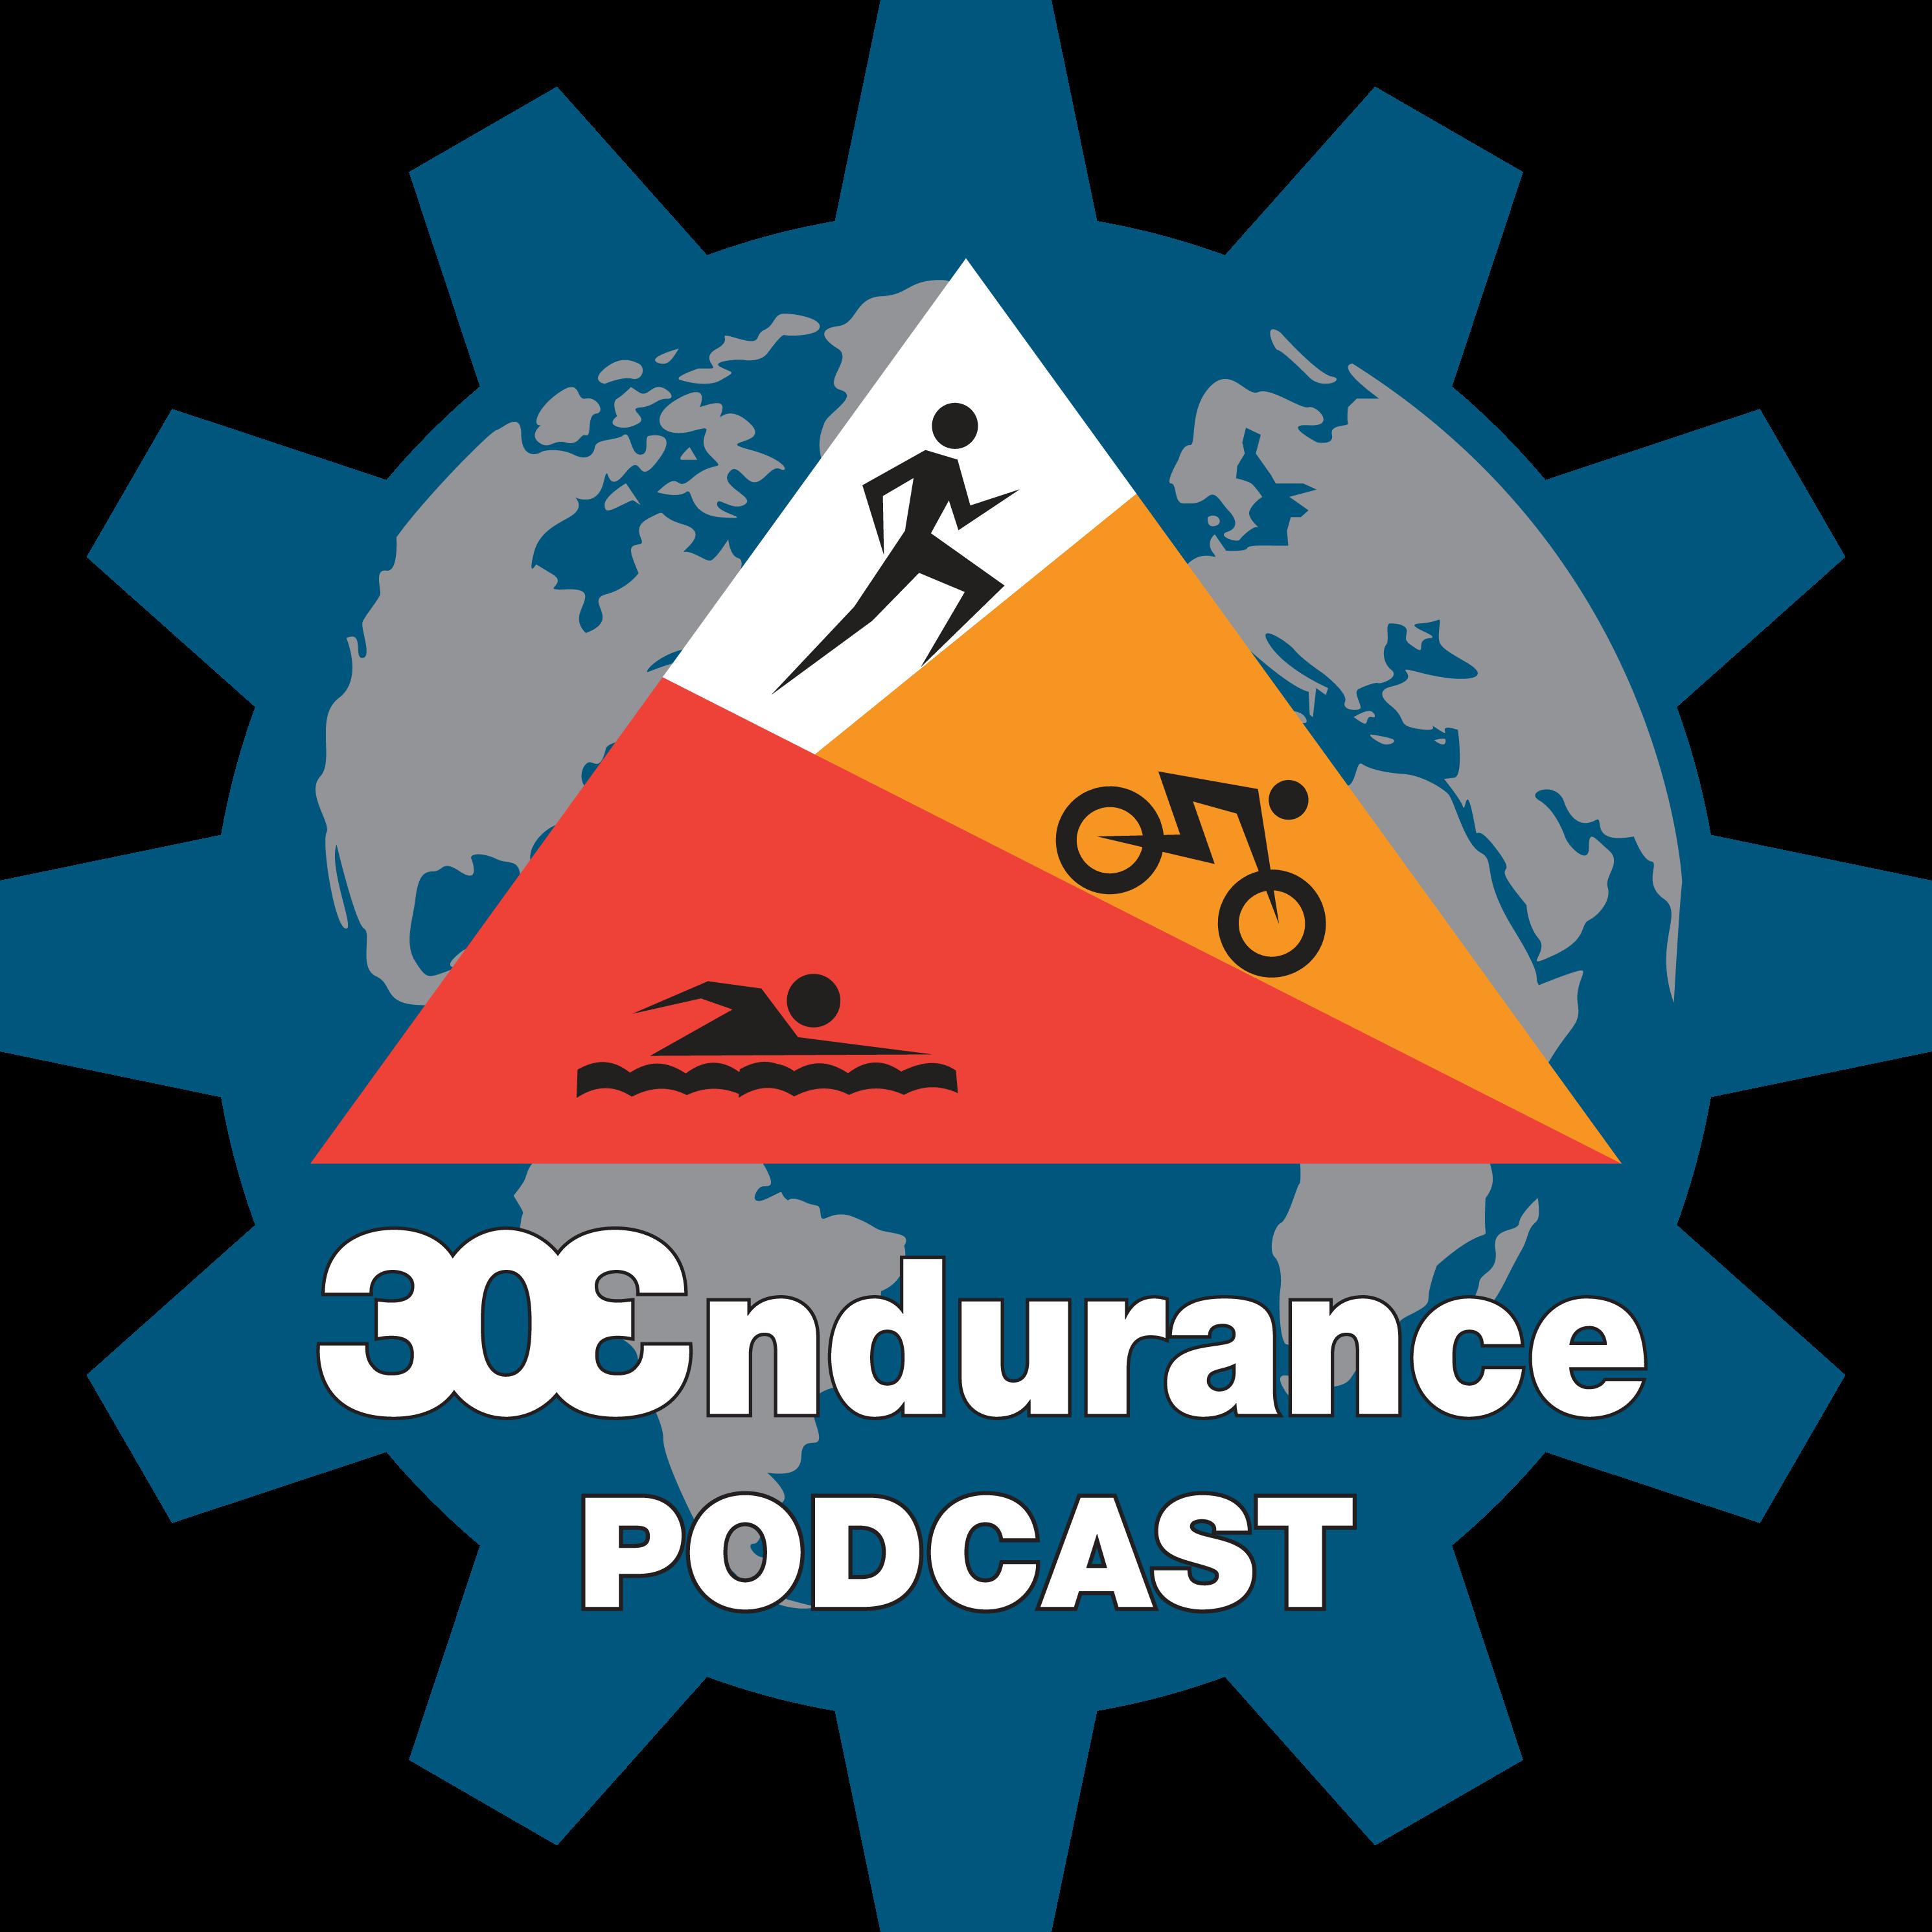 303Endurance Podcast